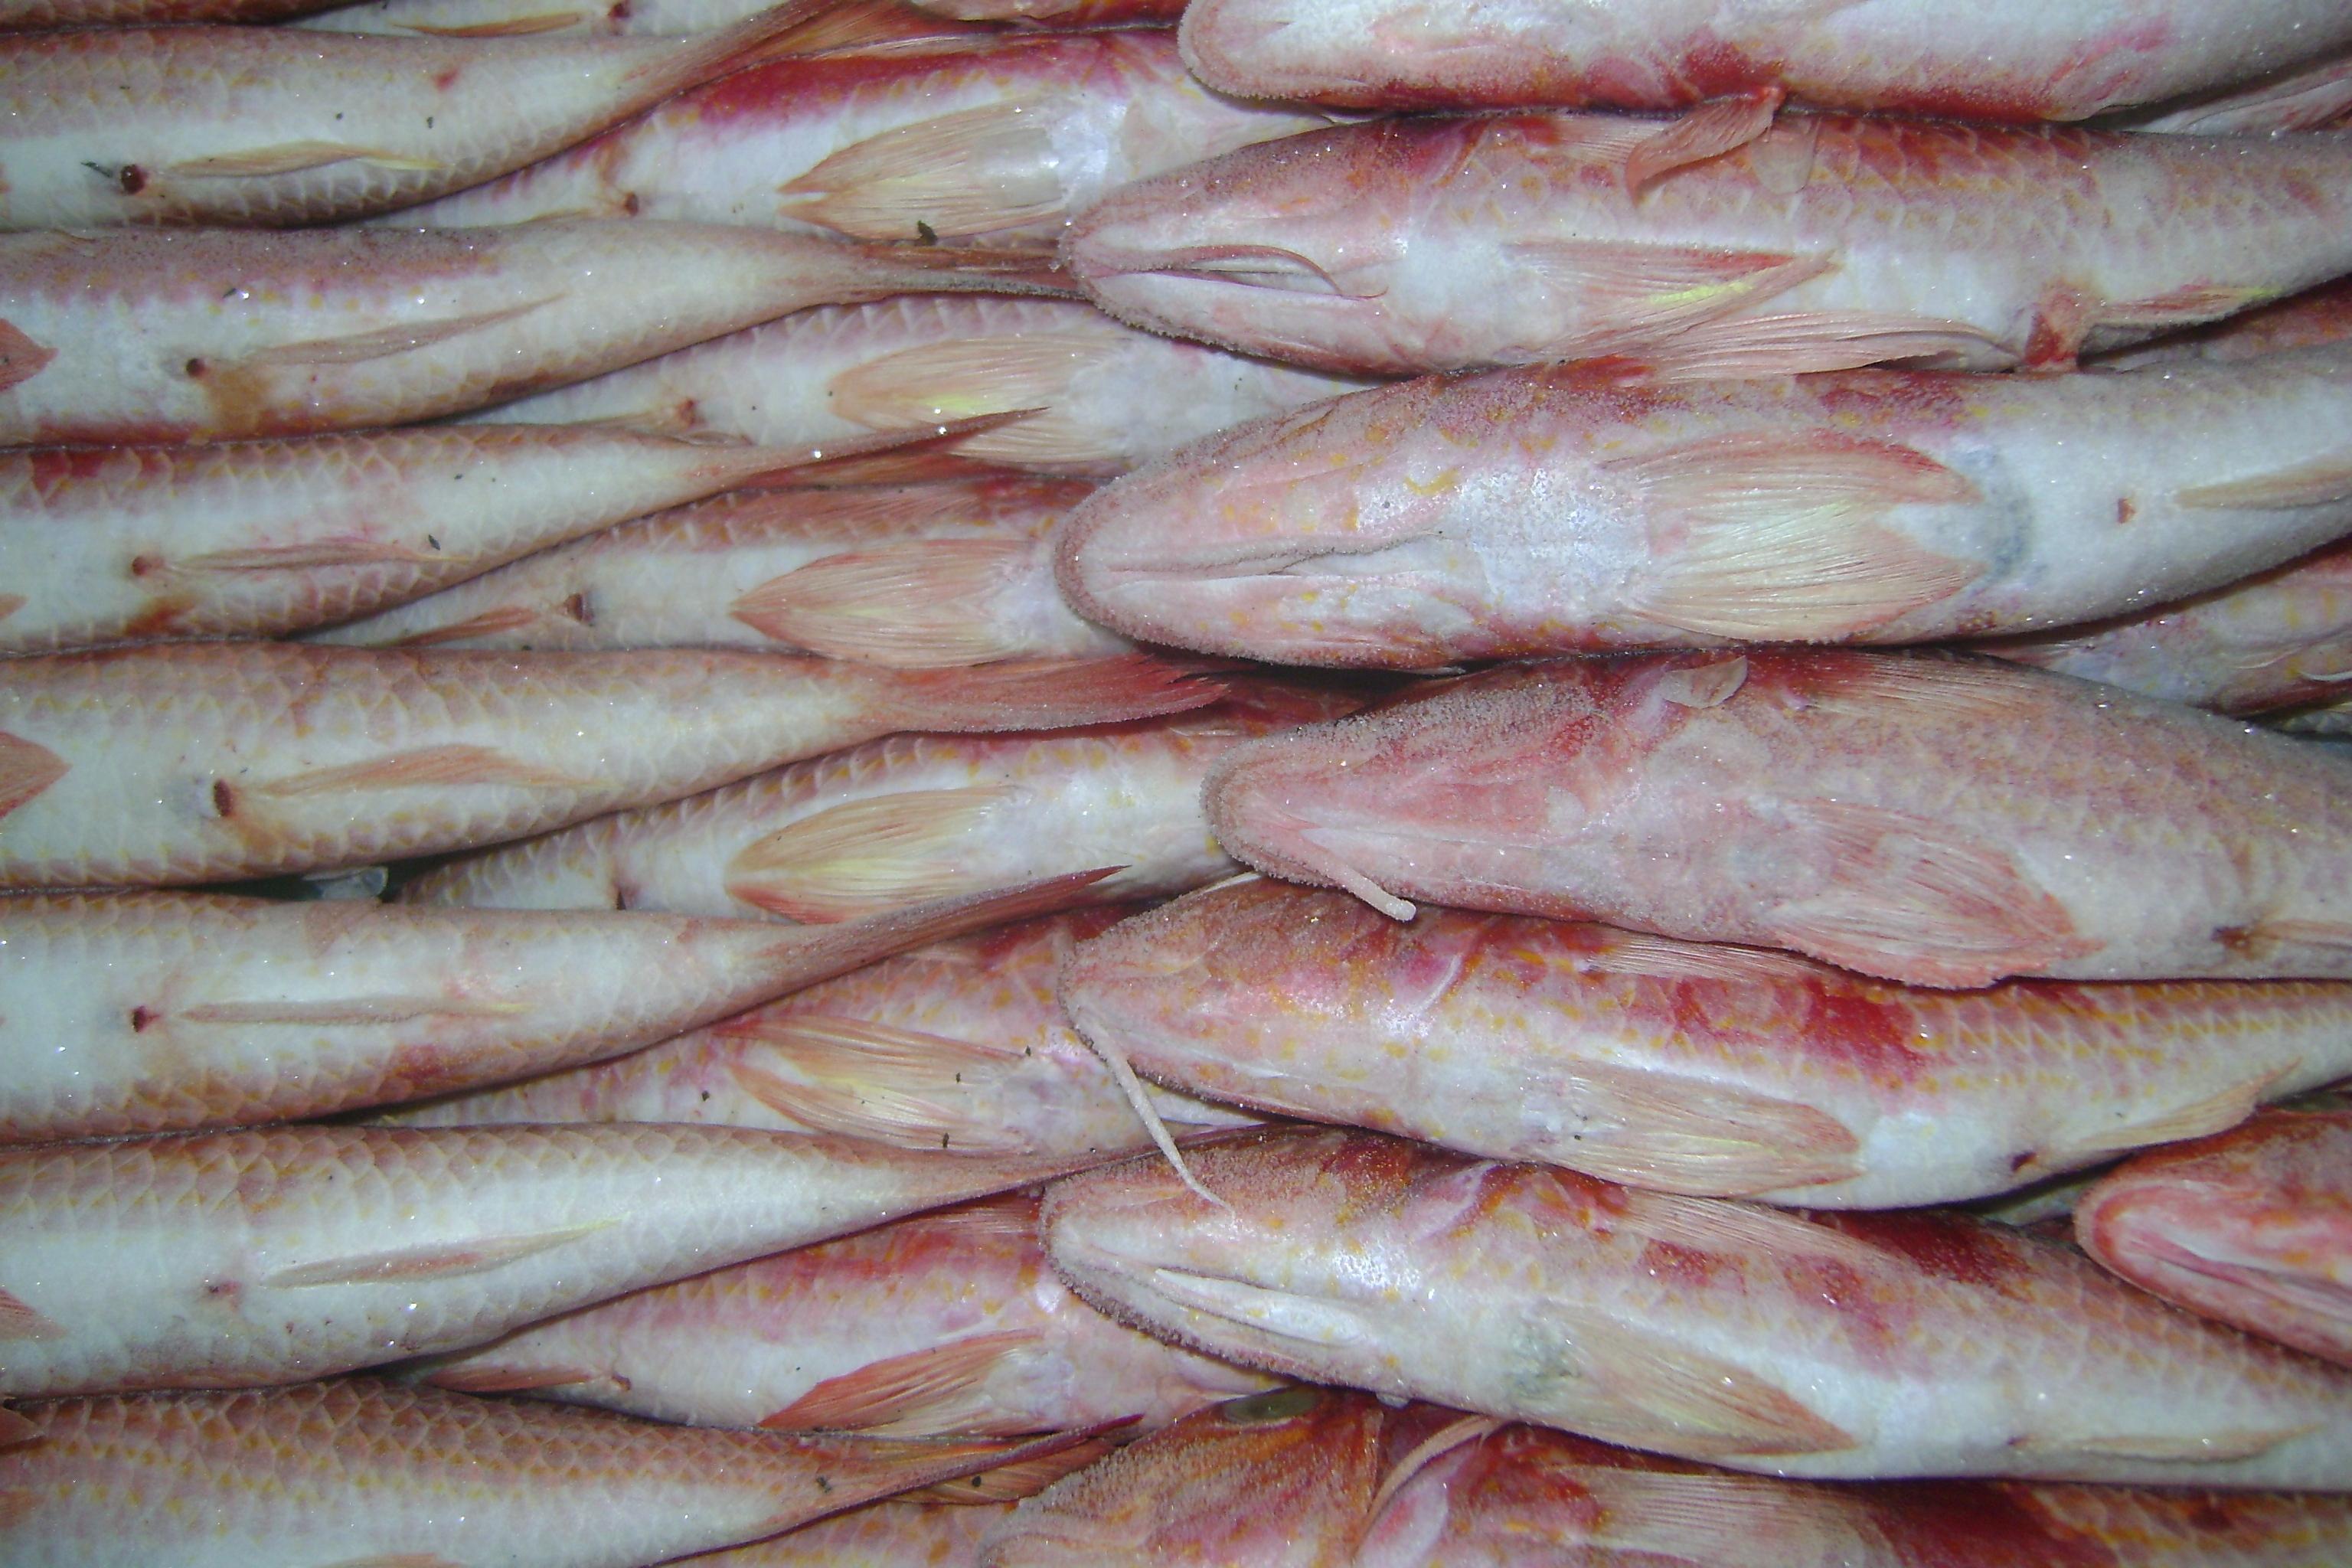 Frozen red mullet frozen goat fish frozen red mullet for Red mullet fish